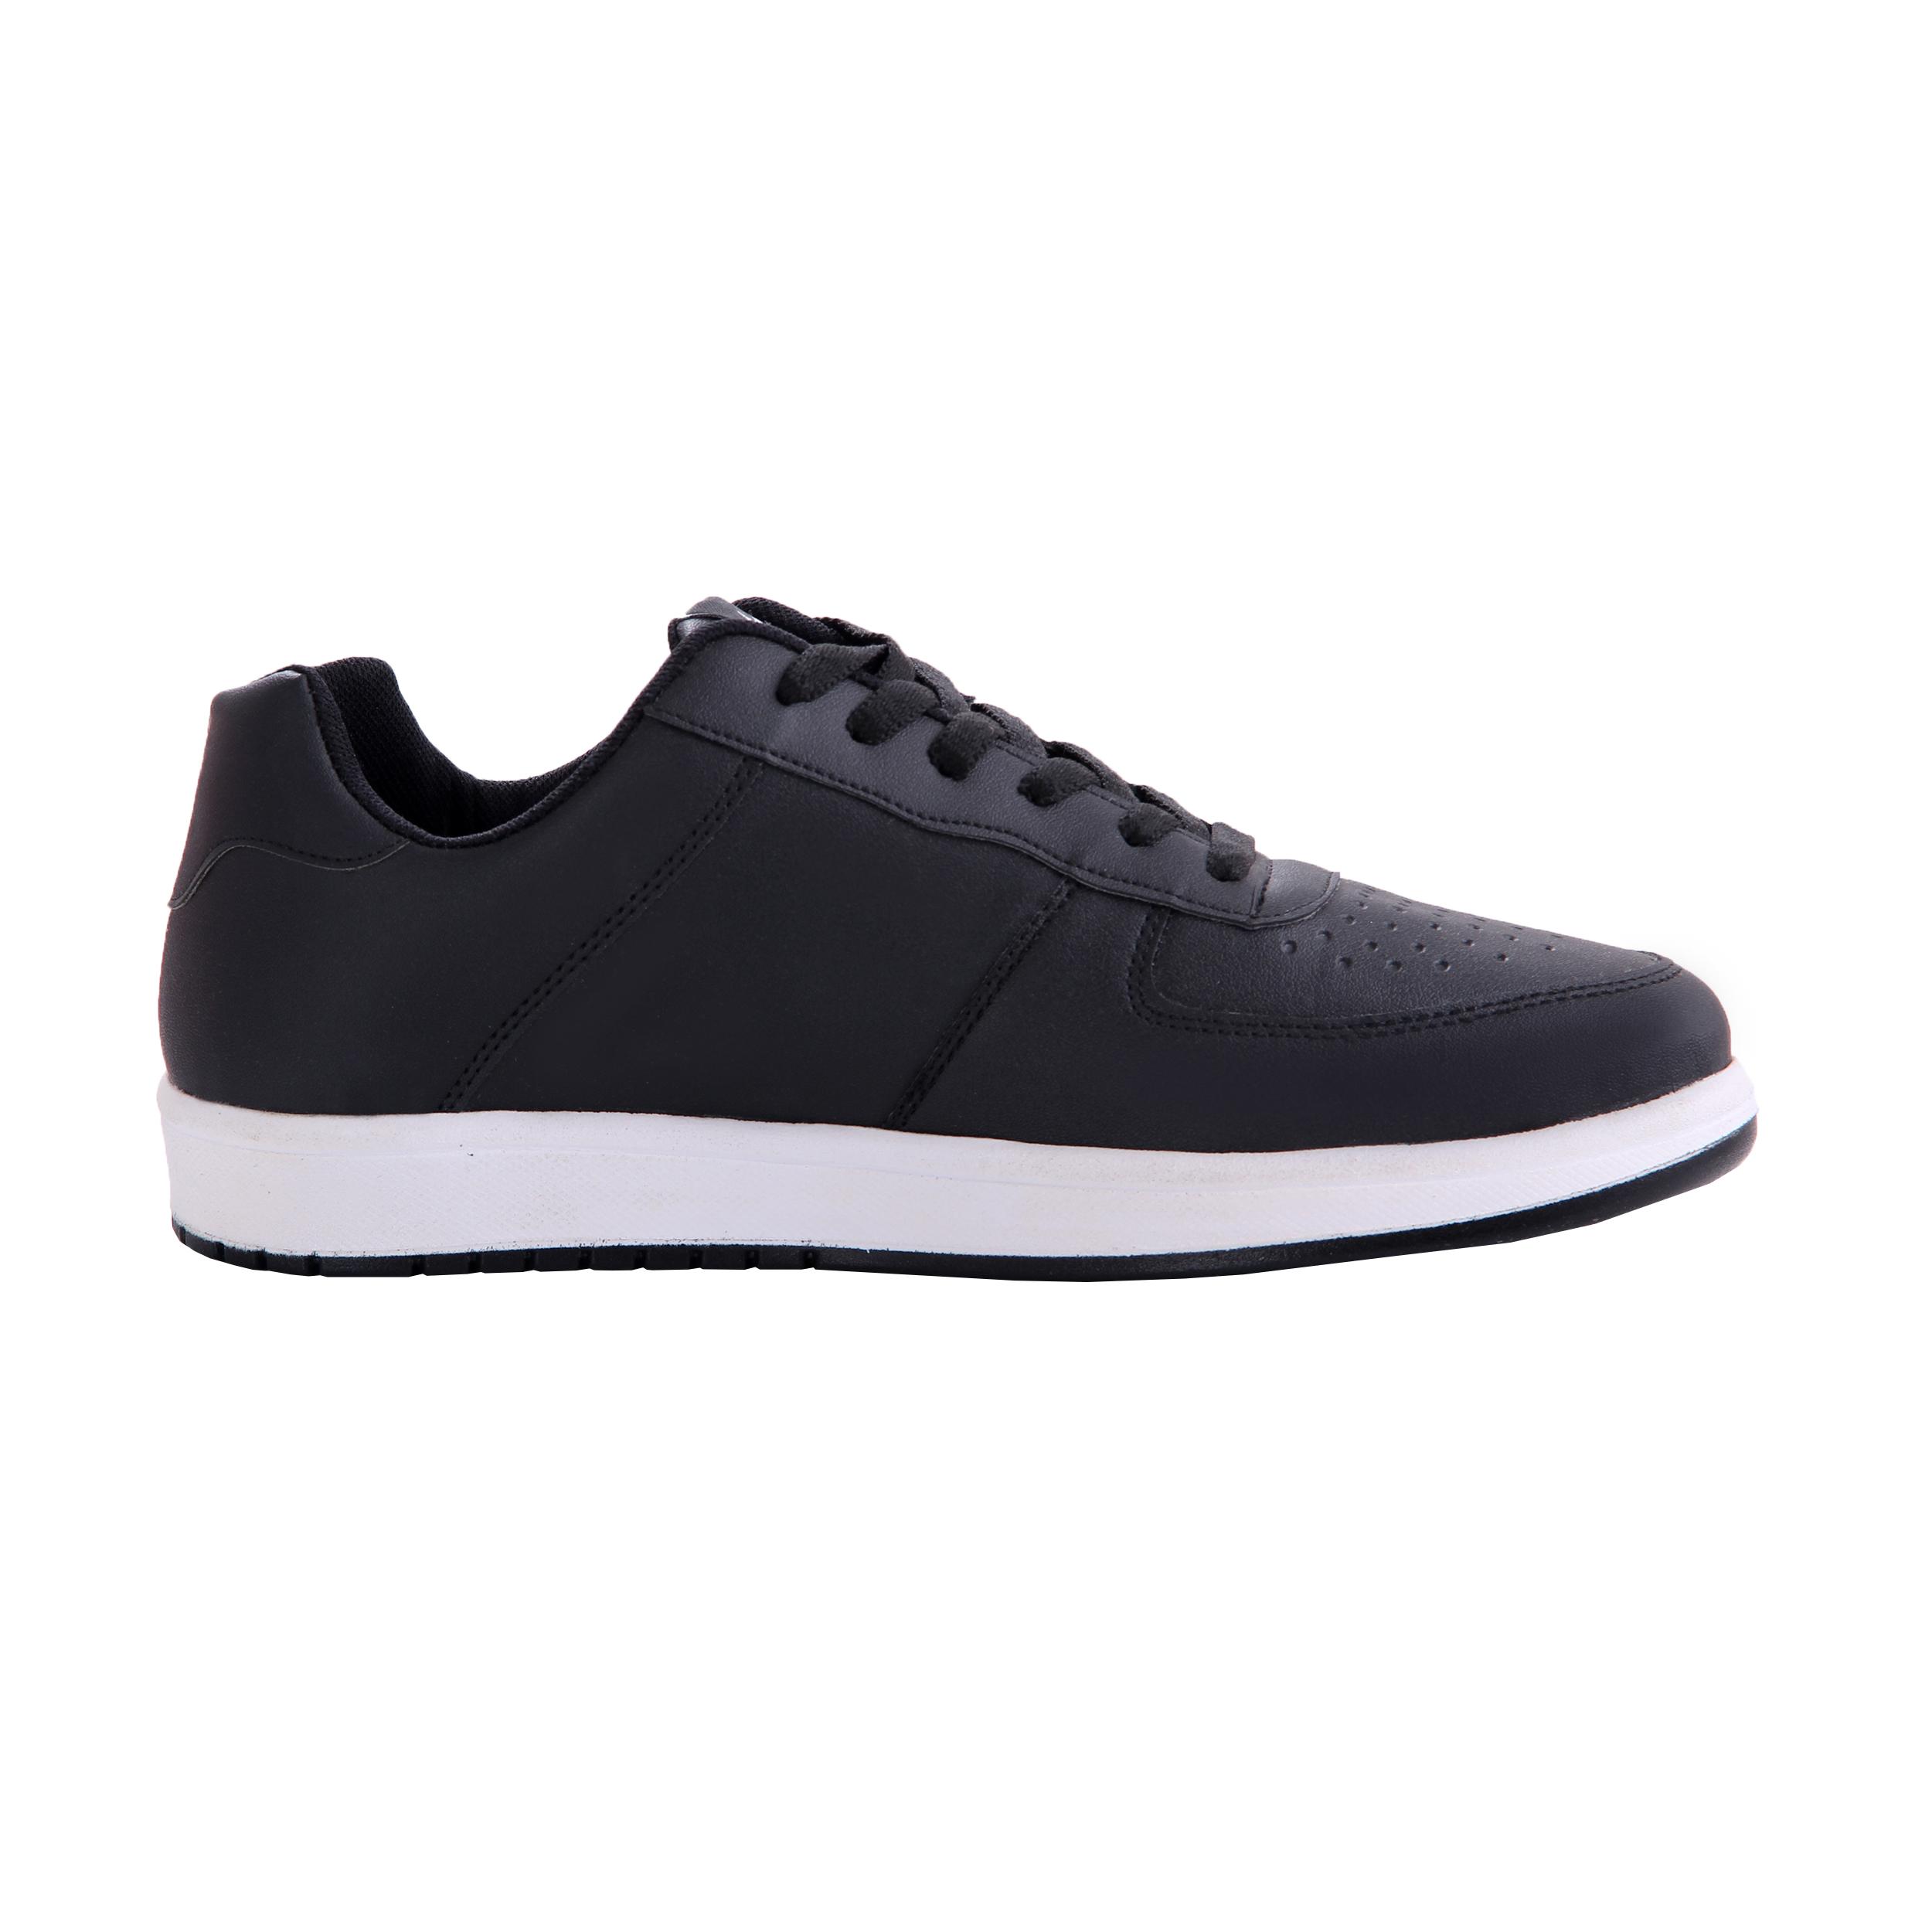 خرید                      کفش اسپورت مردانه کد 25-2397990